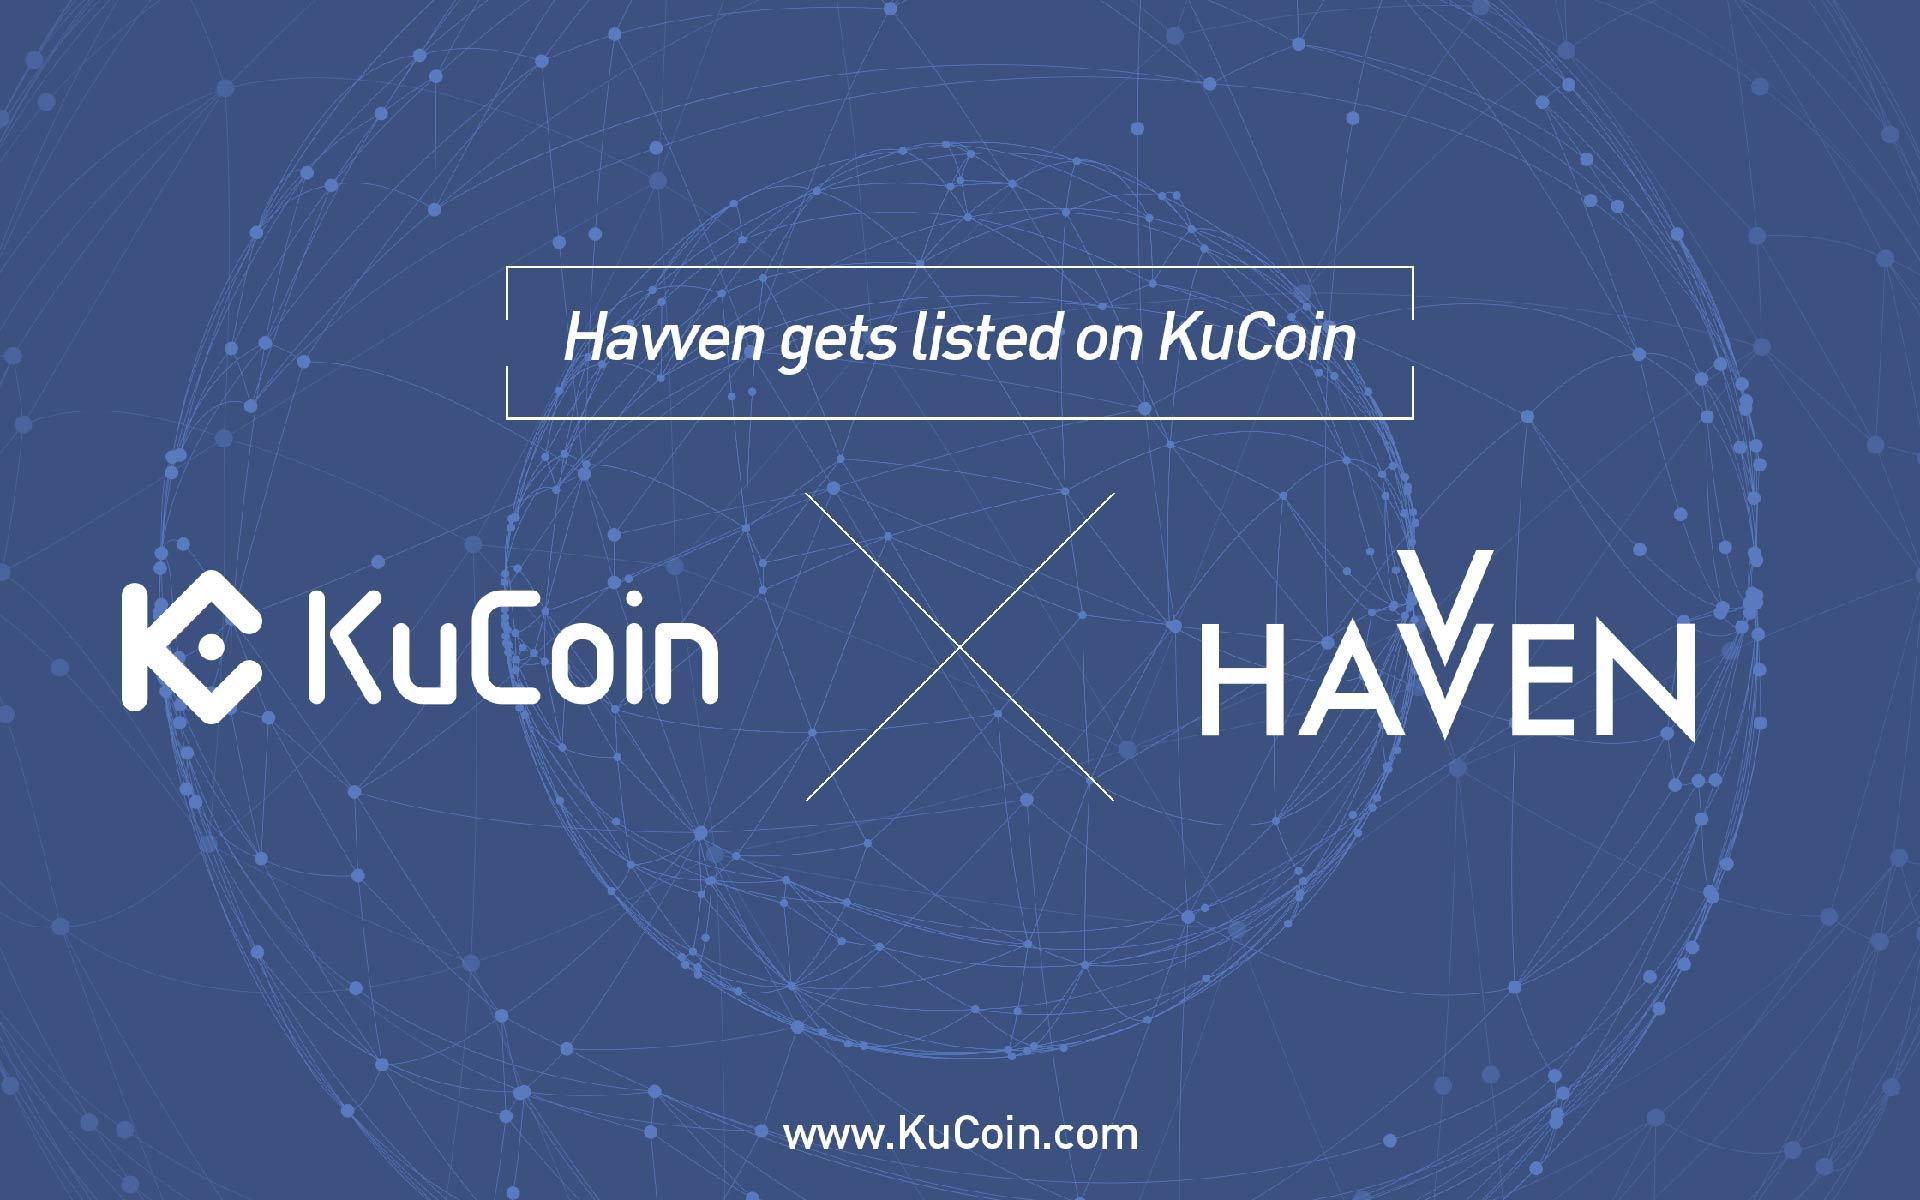 Havven (HAV) Gets Listed on KuCoin!